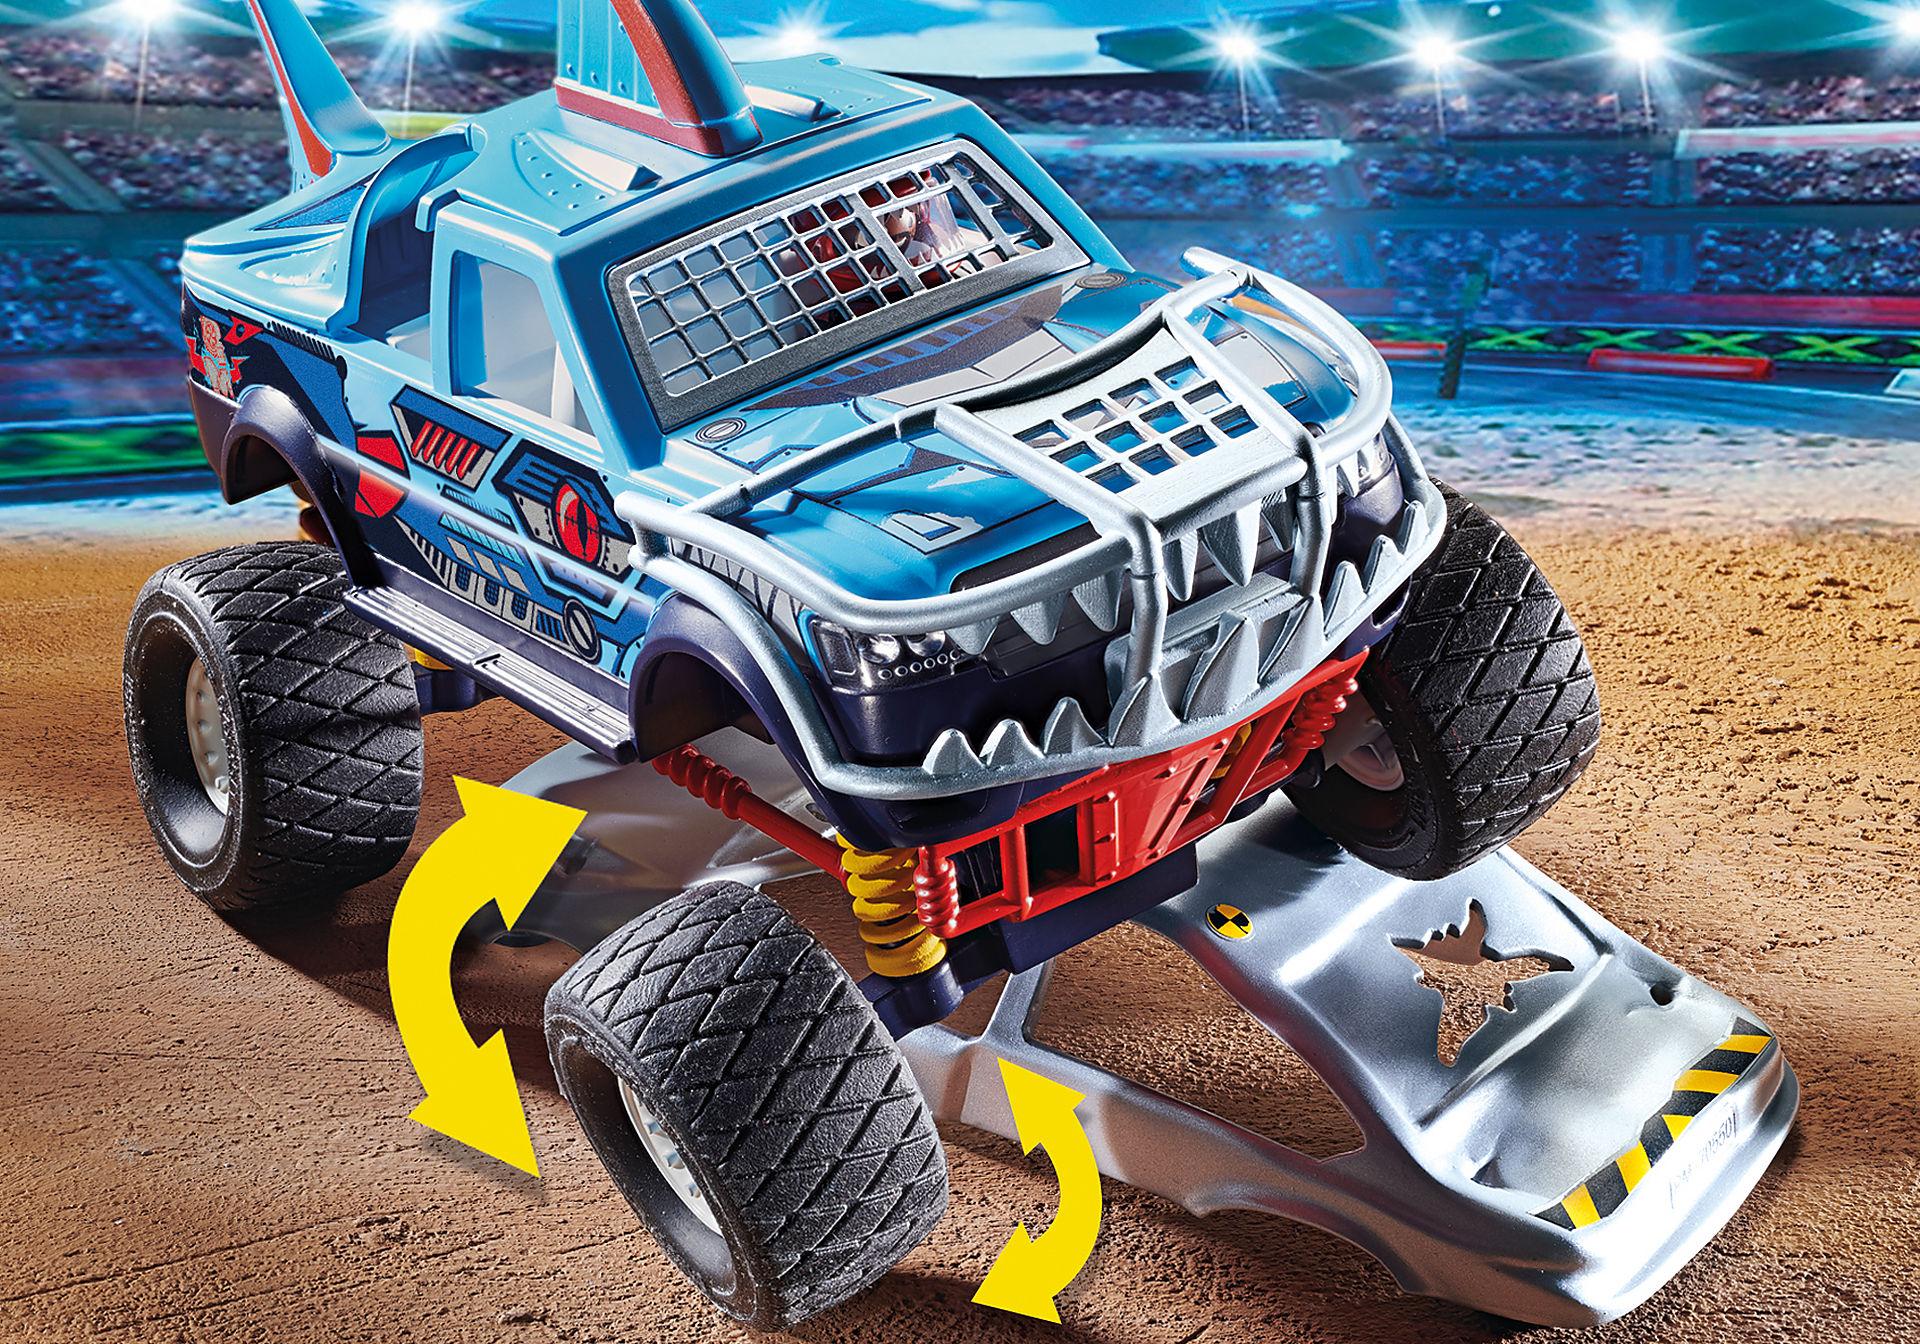 70550 Stuntshow Monster Truck Hval zoom image4